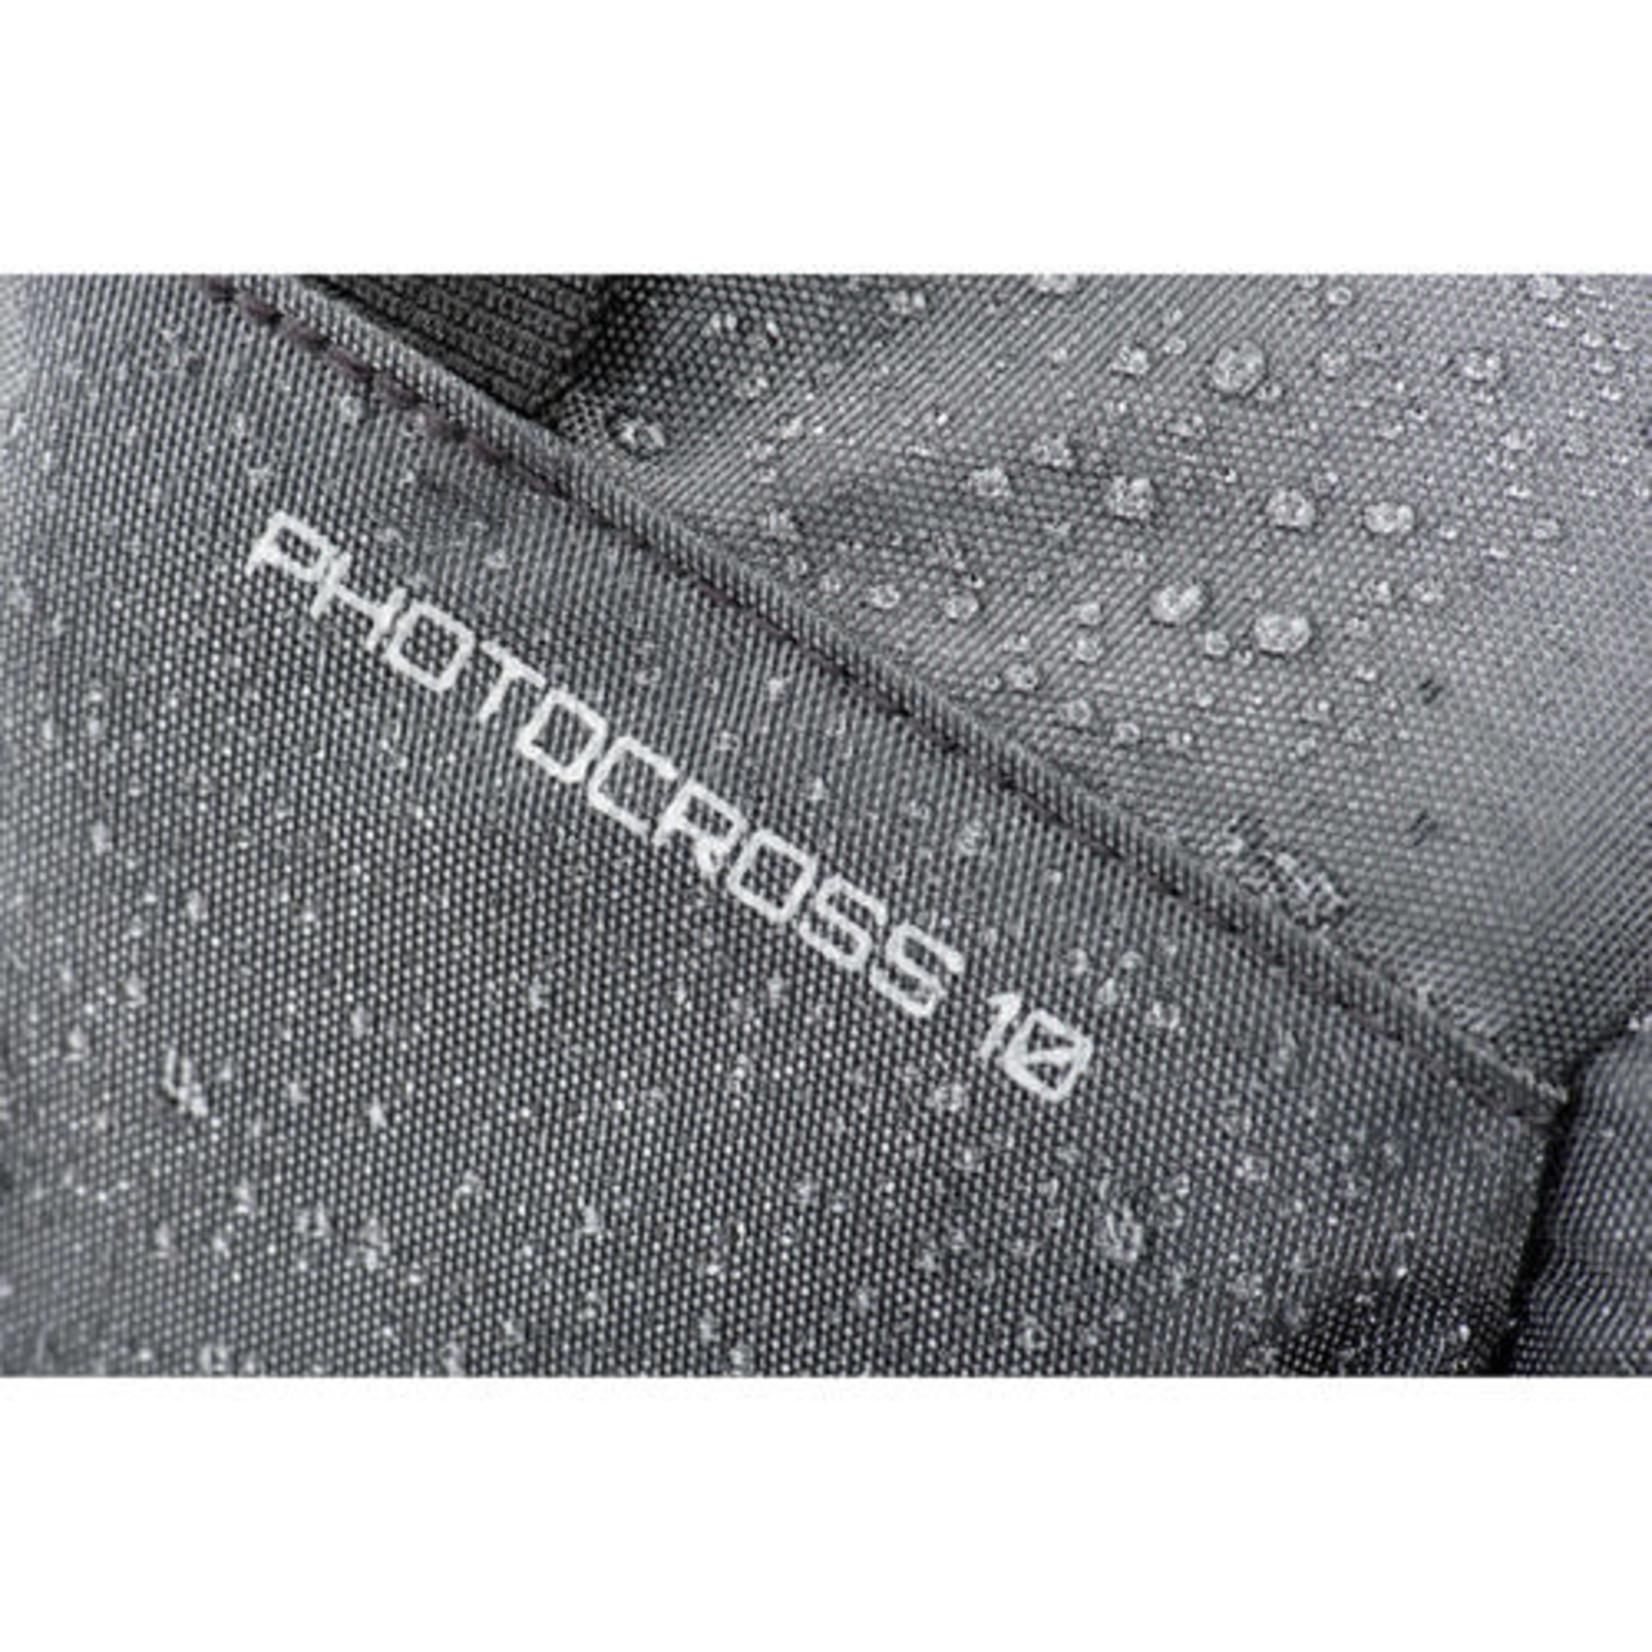 MindShift PhotoCross 10, Carbon Grey